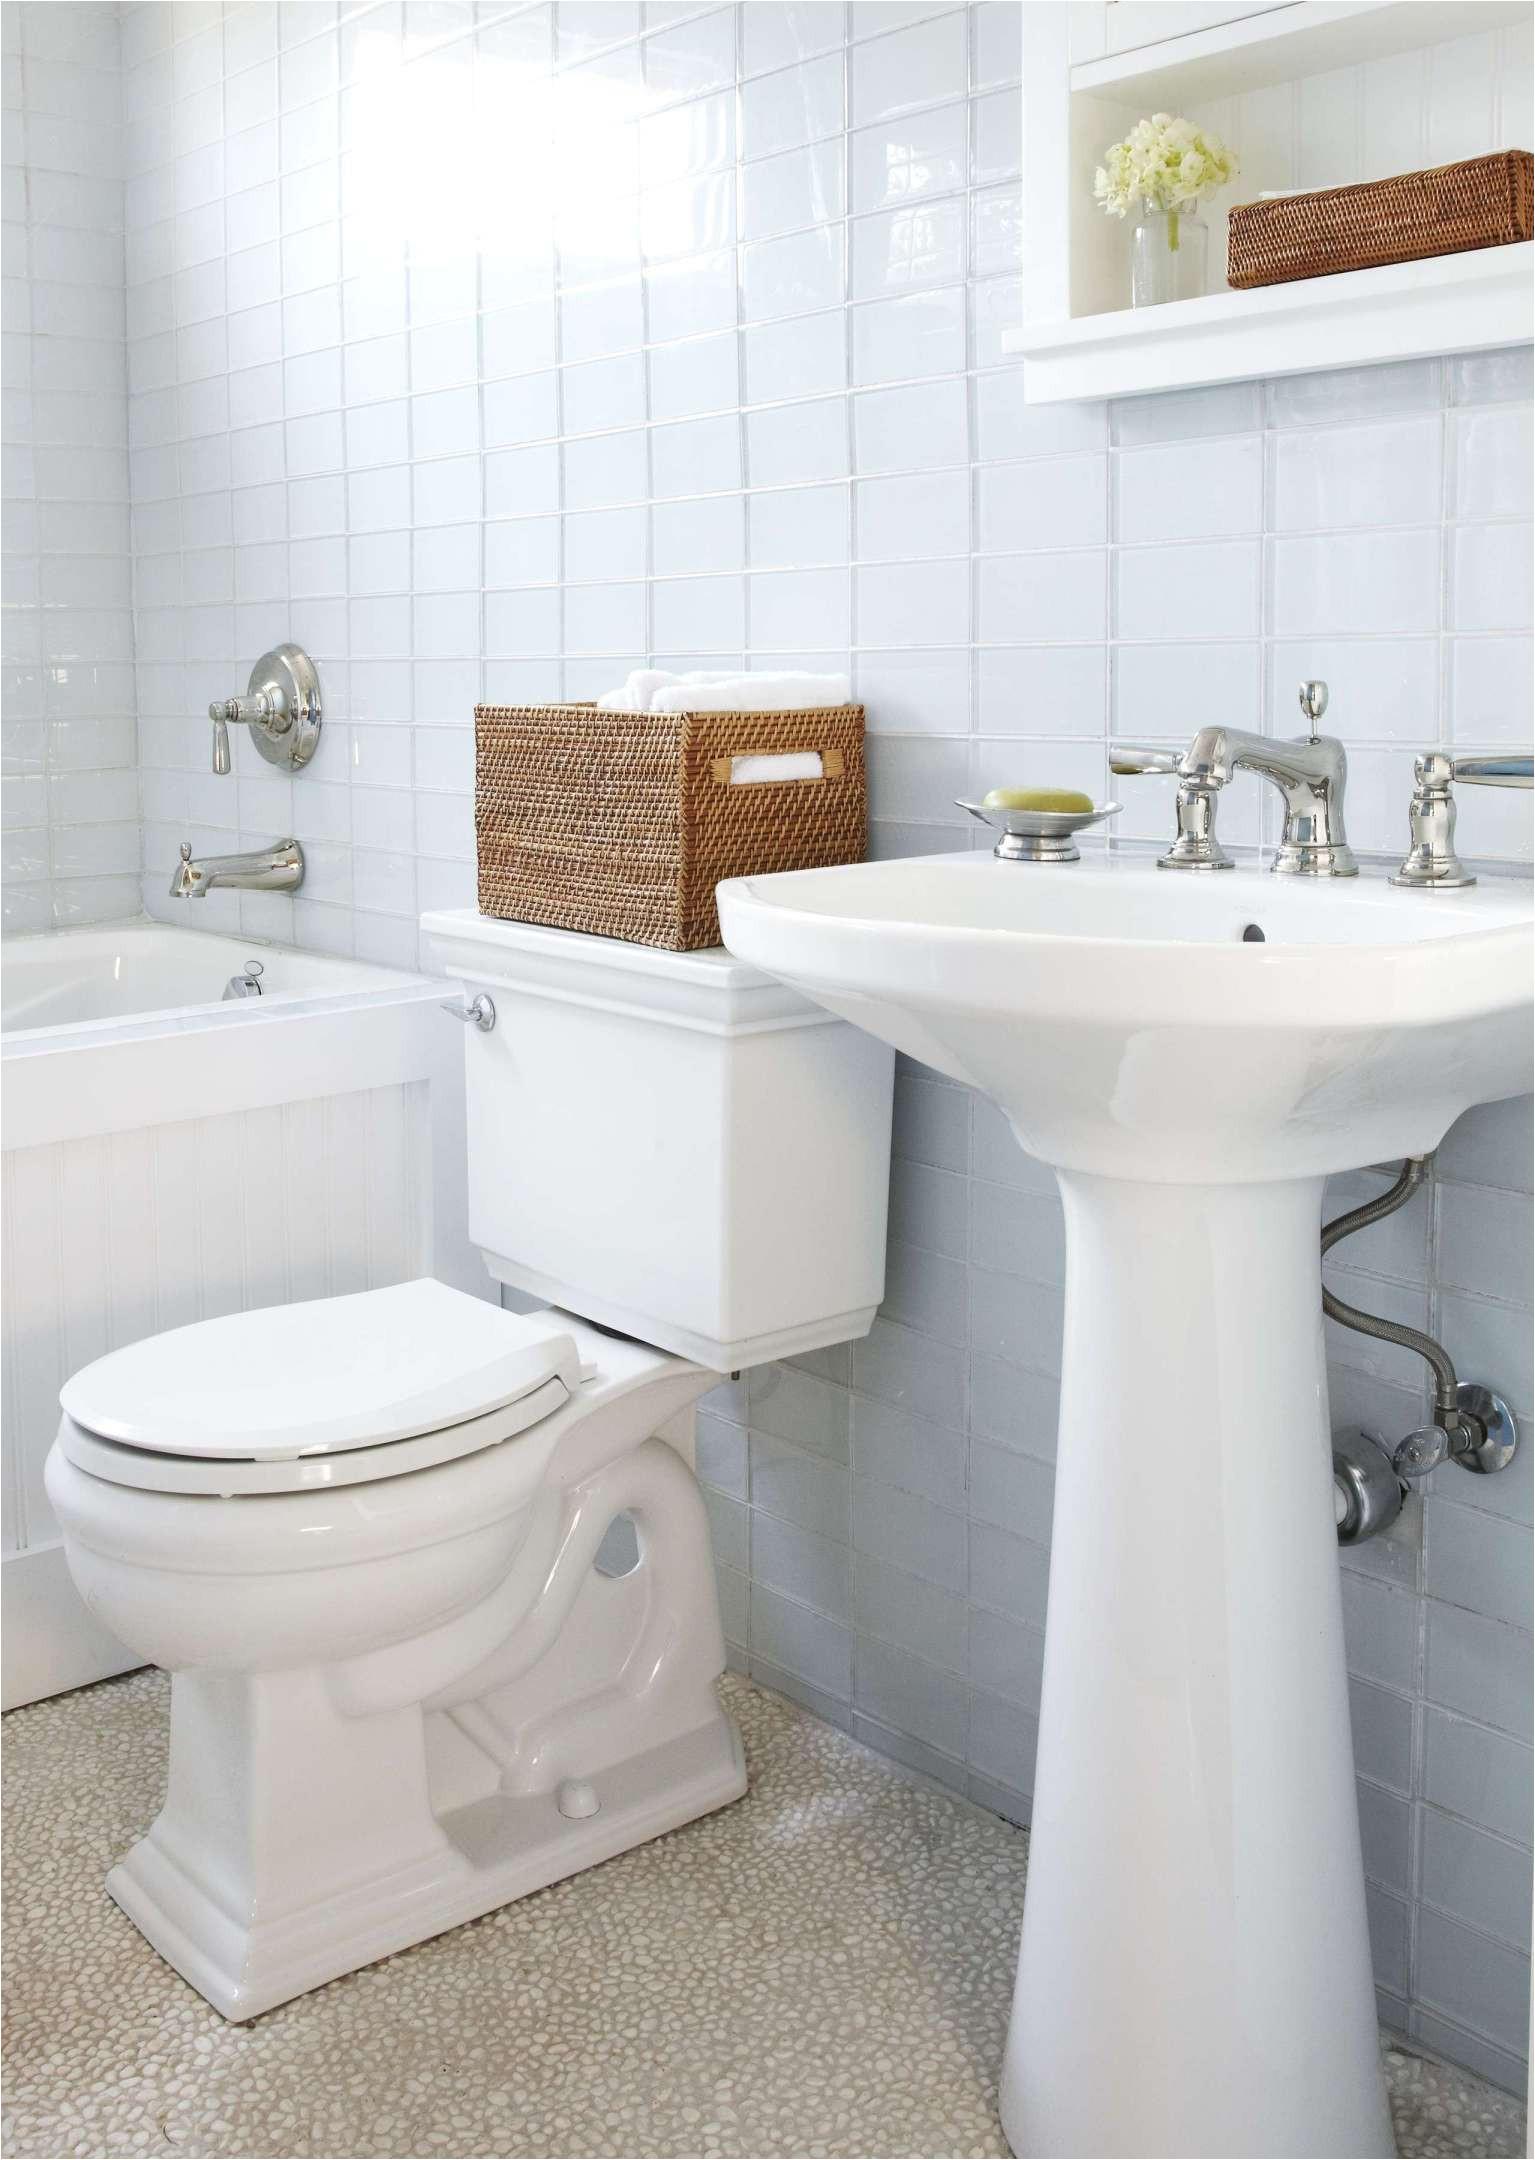 bathroom tiles ideas for small bathrooms best of astounding bathroom tiles designs home decor tile fresh